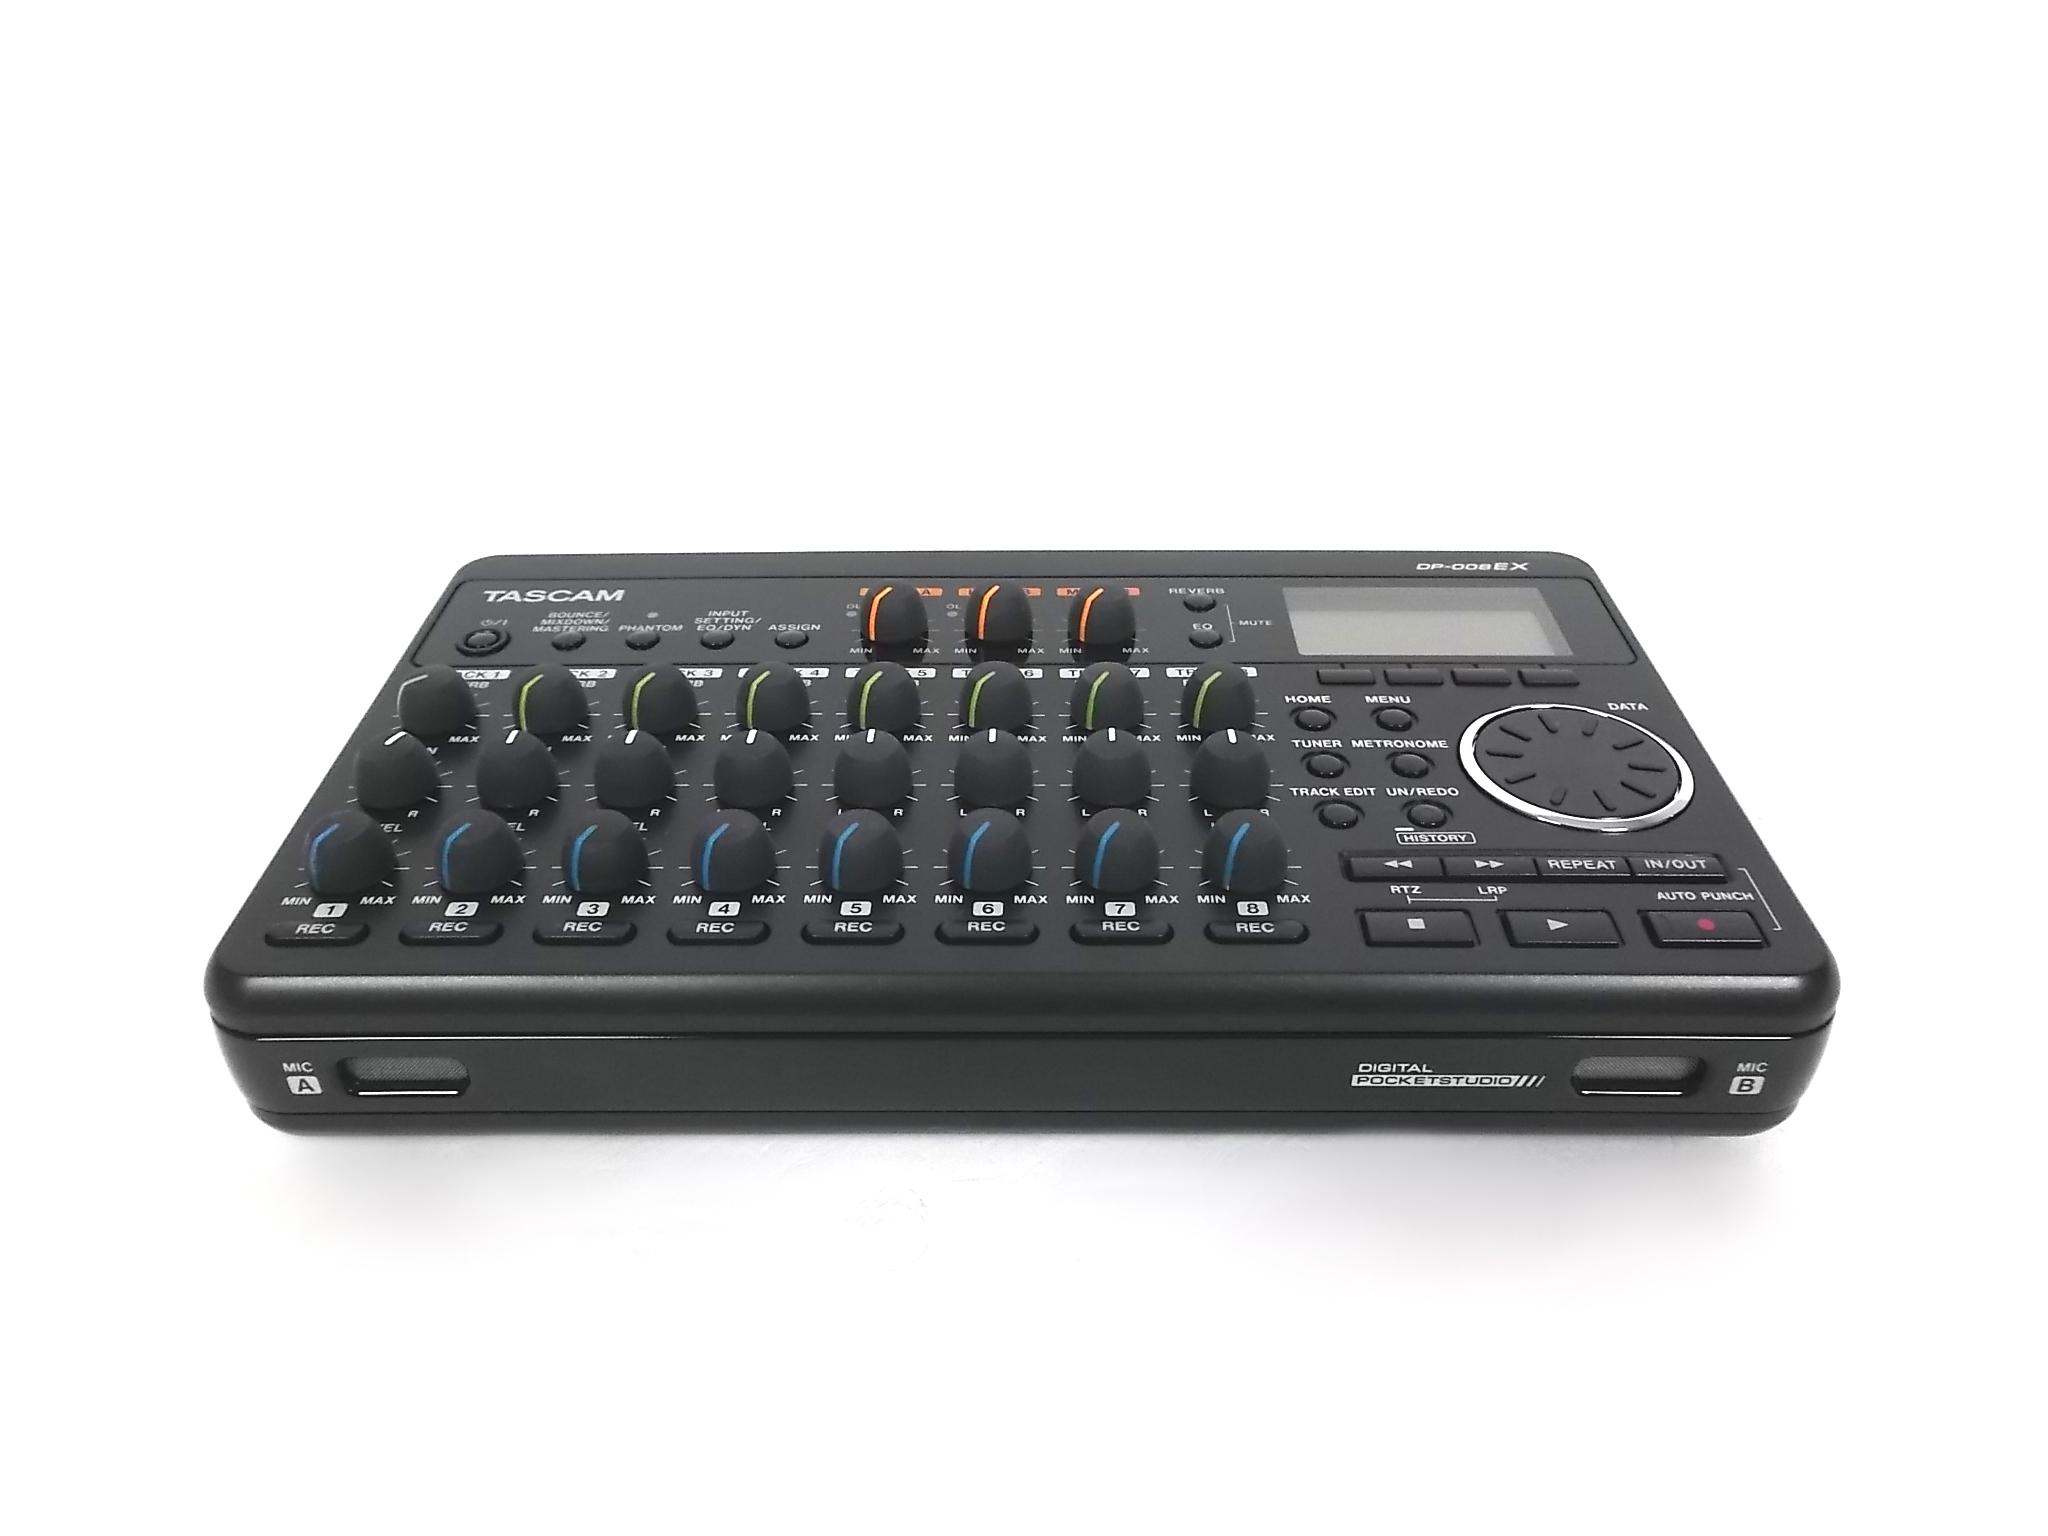 tascam dp 008ex digital portastudio 8 track portable multi track recorder mint ebay. Black Bedroom Furniture Sets. Home Design Ideas